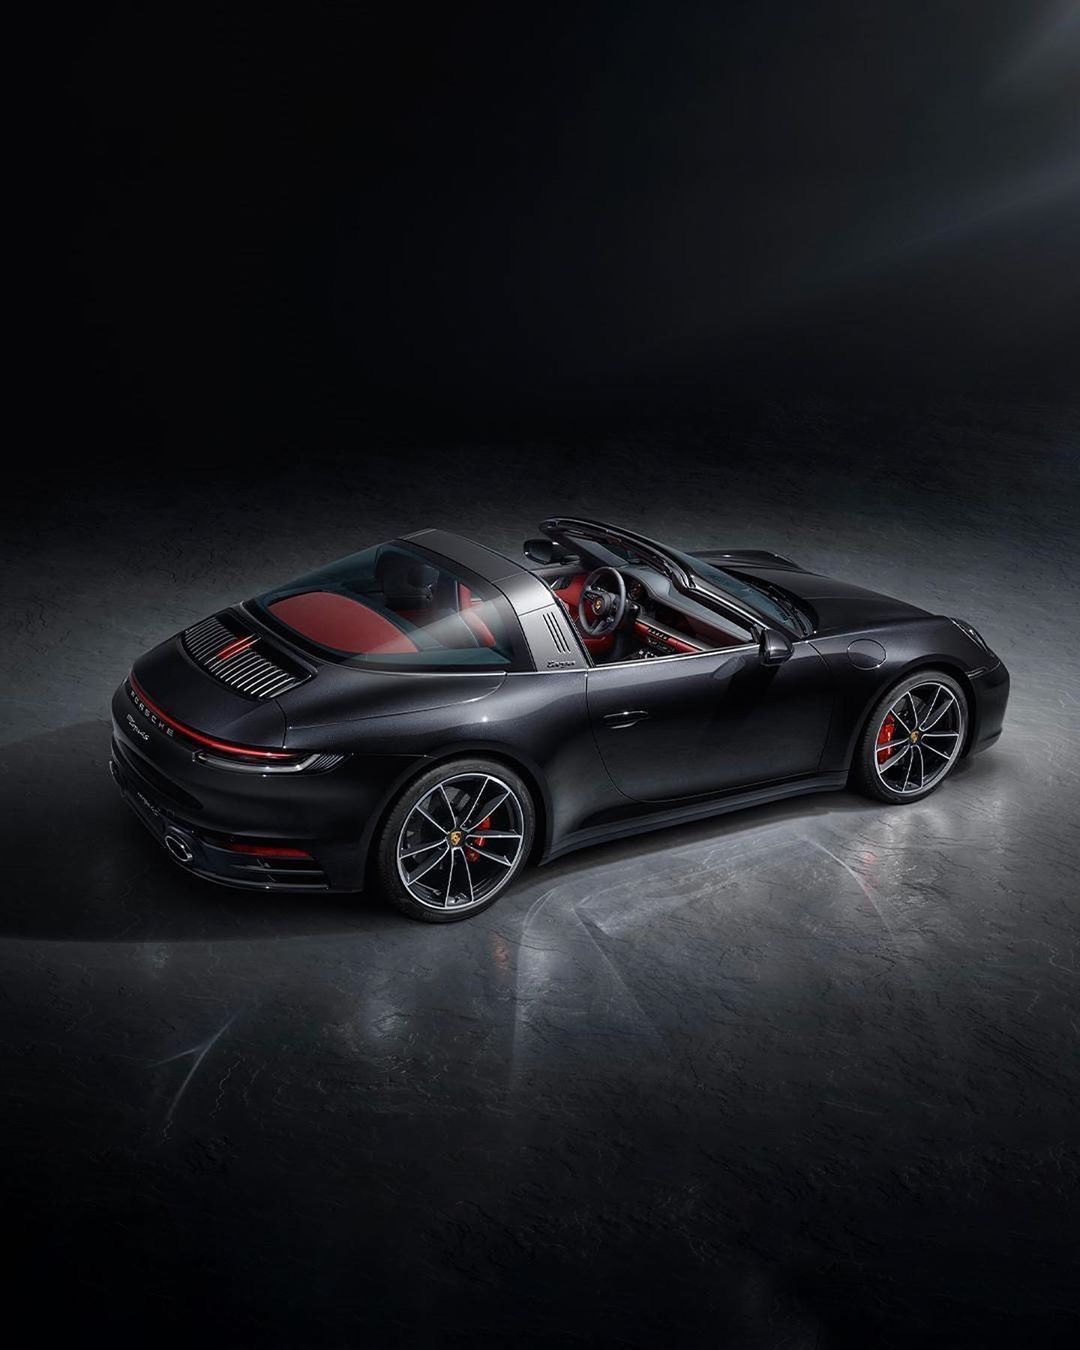 Pin by Sander Méndez on Car Technology in 2020 Porsche